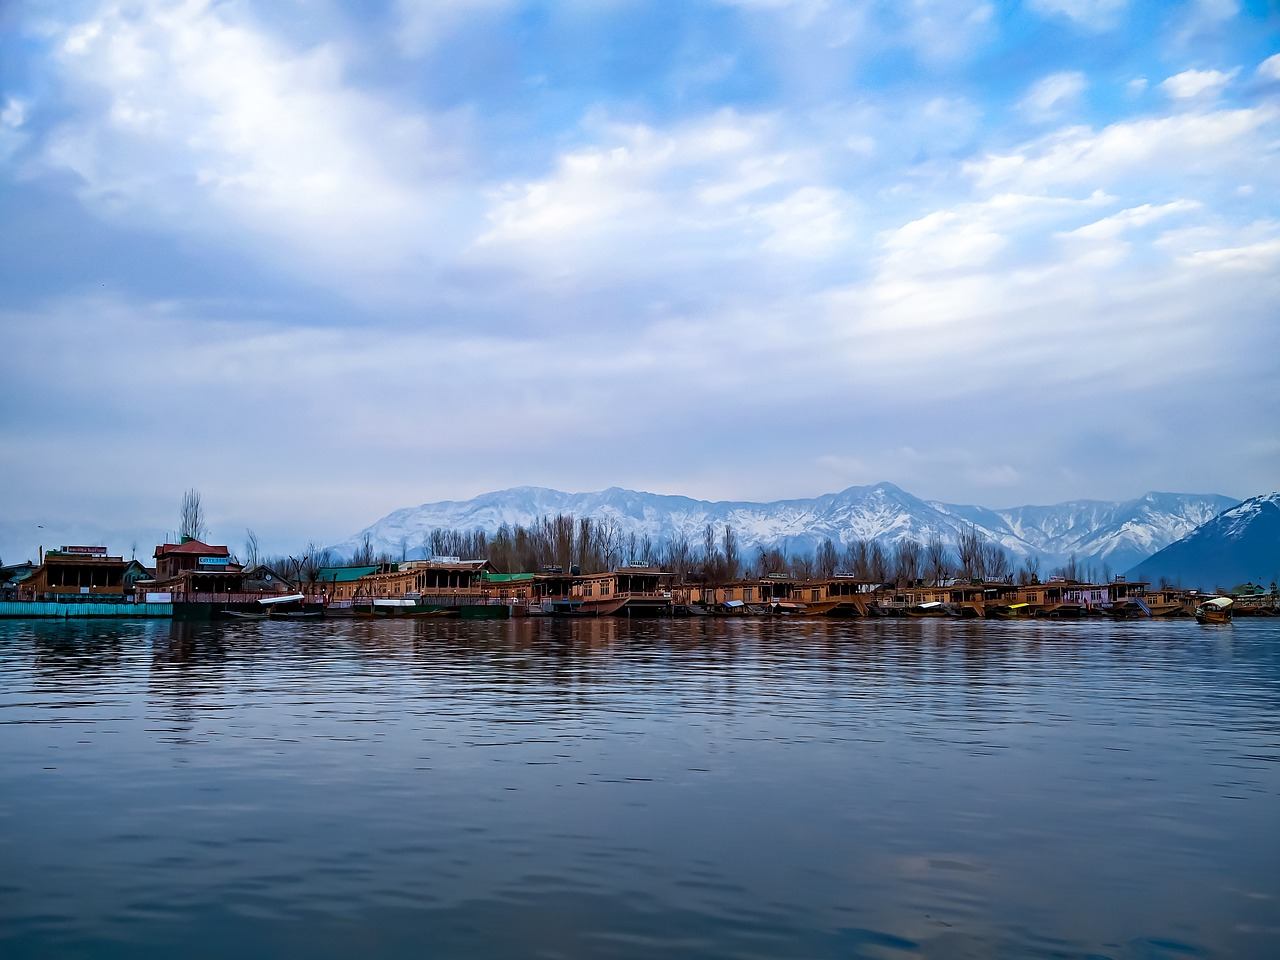 Ethereal Kashmir